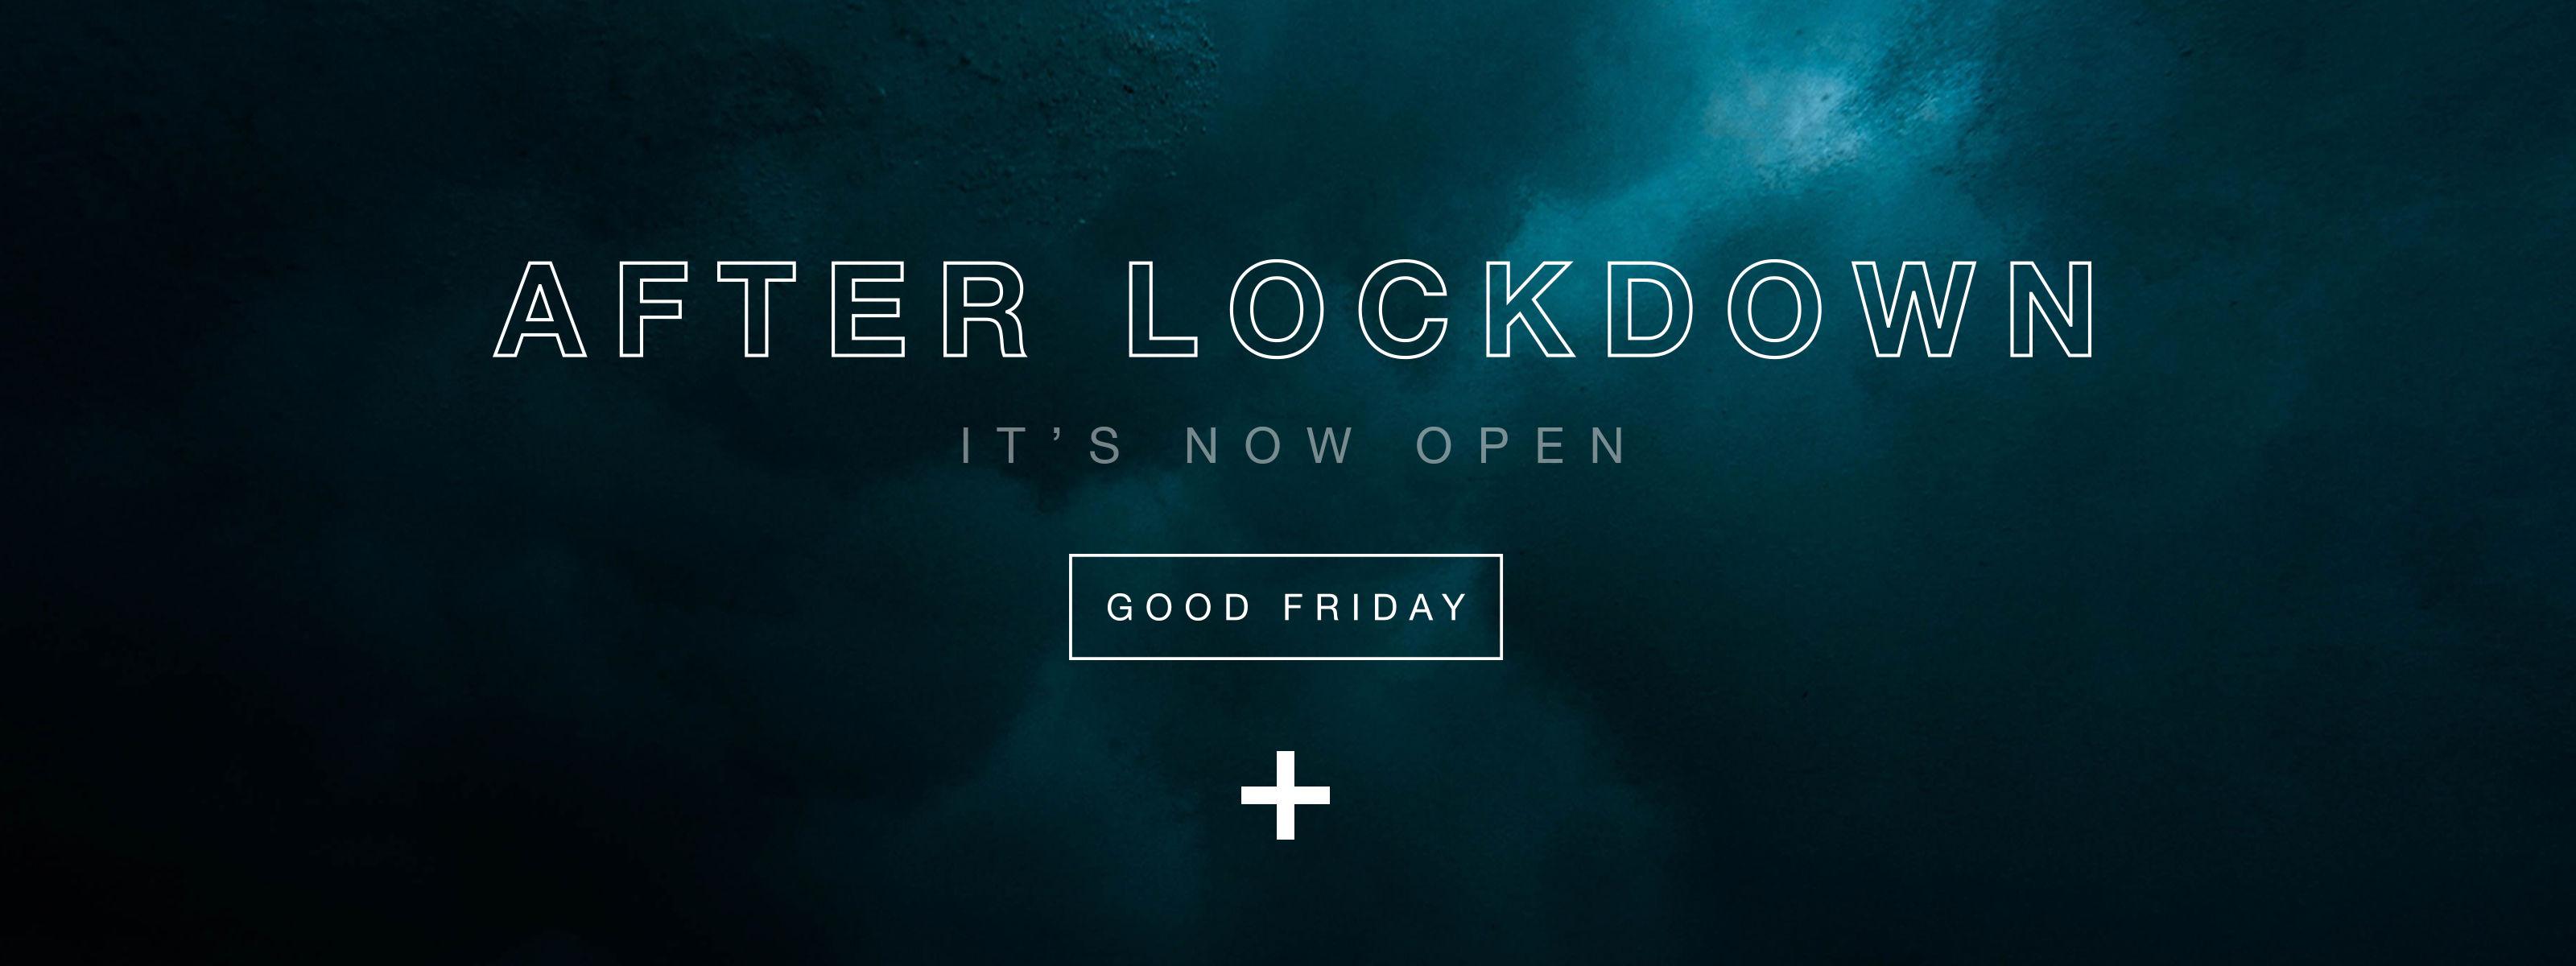 After Lockdown: It's Now Open